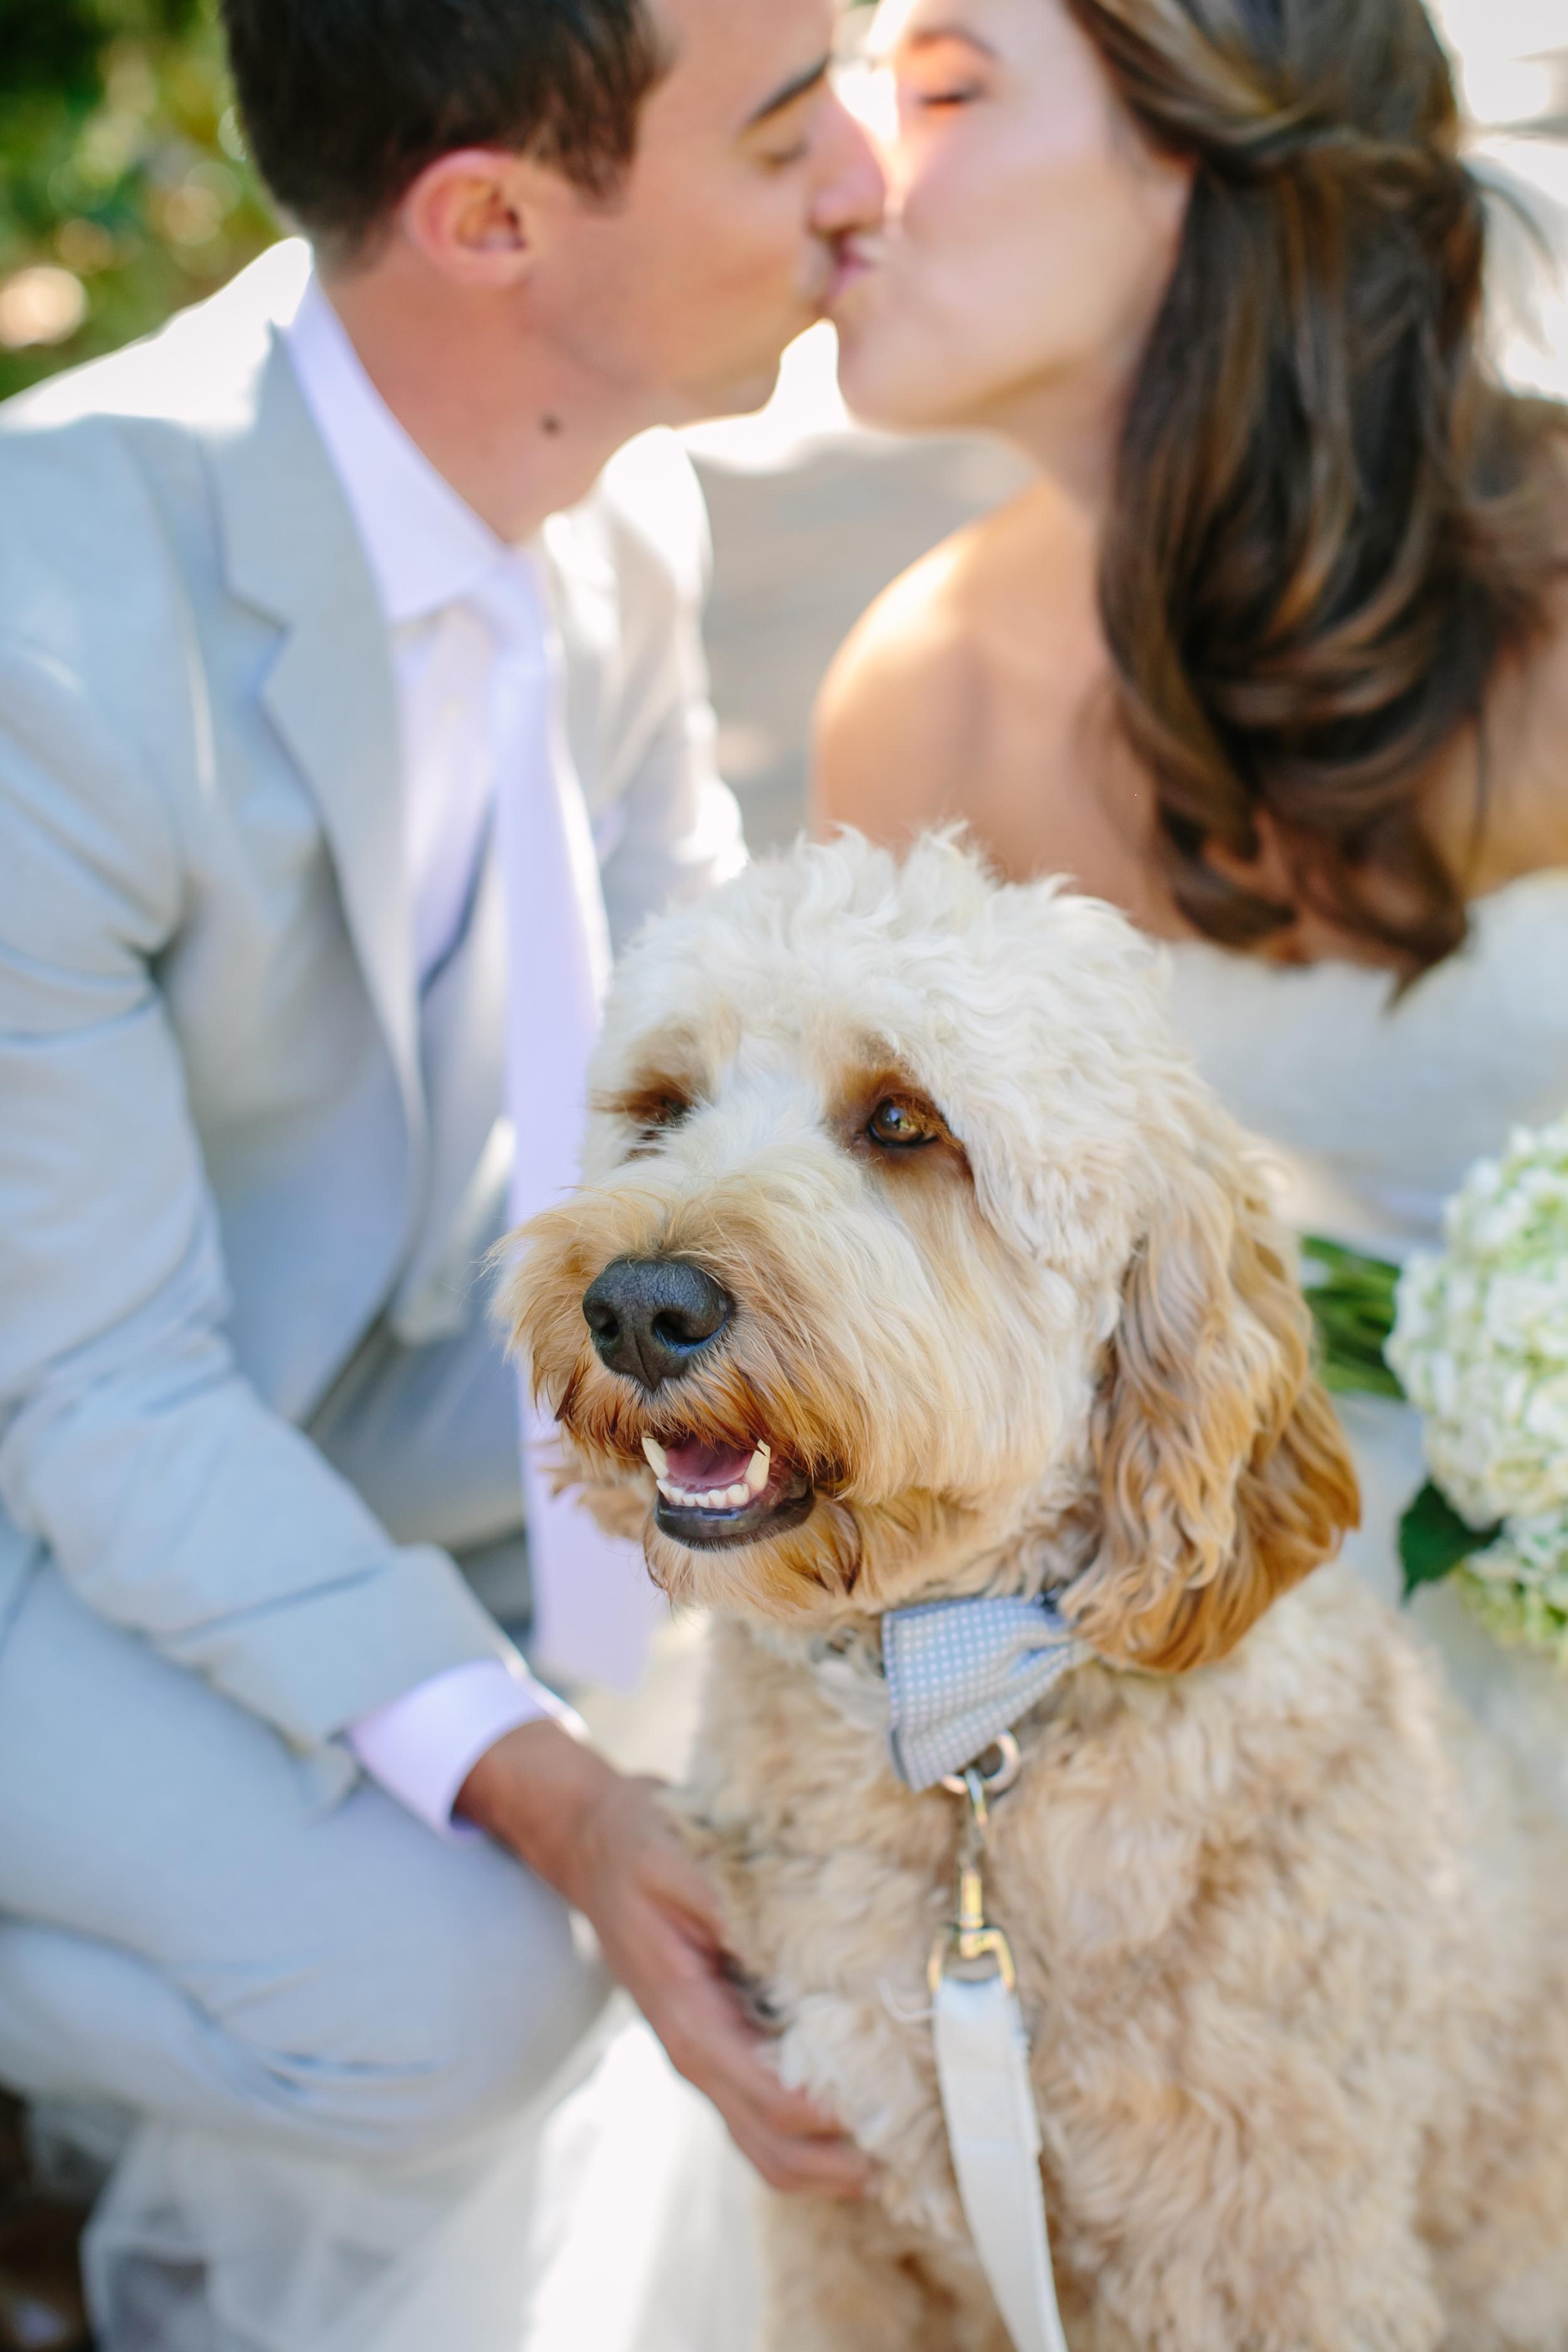 02KR-Wedding-Teasers-Indu-Huynh-Photography.jpg